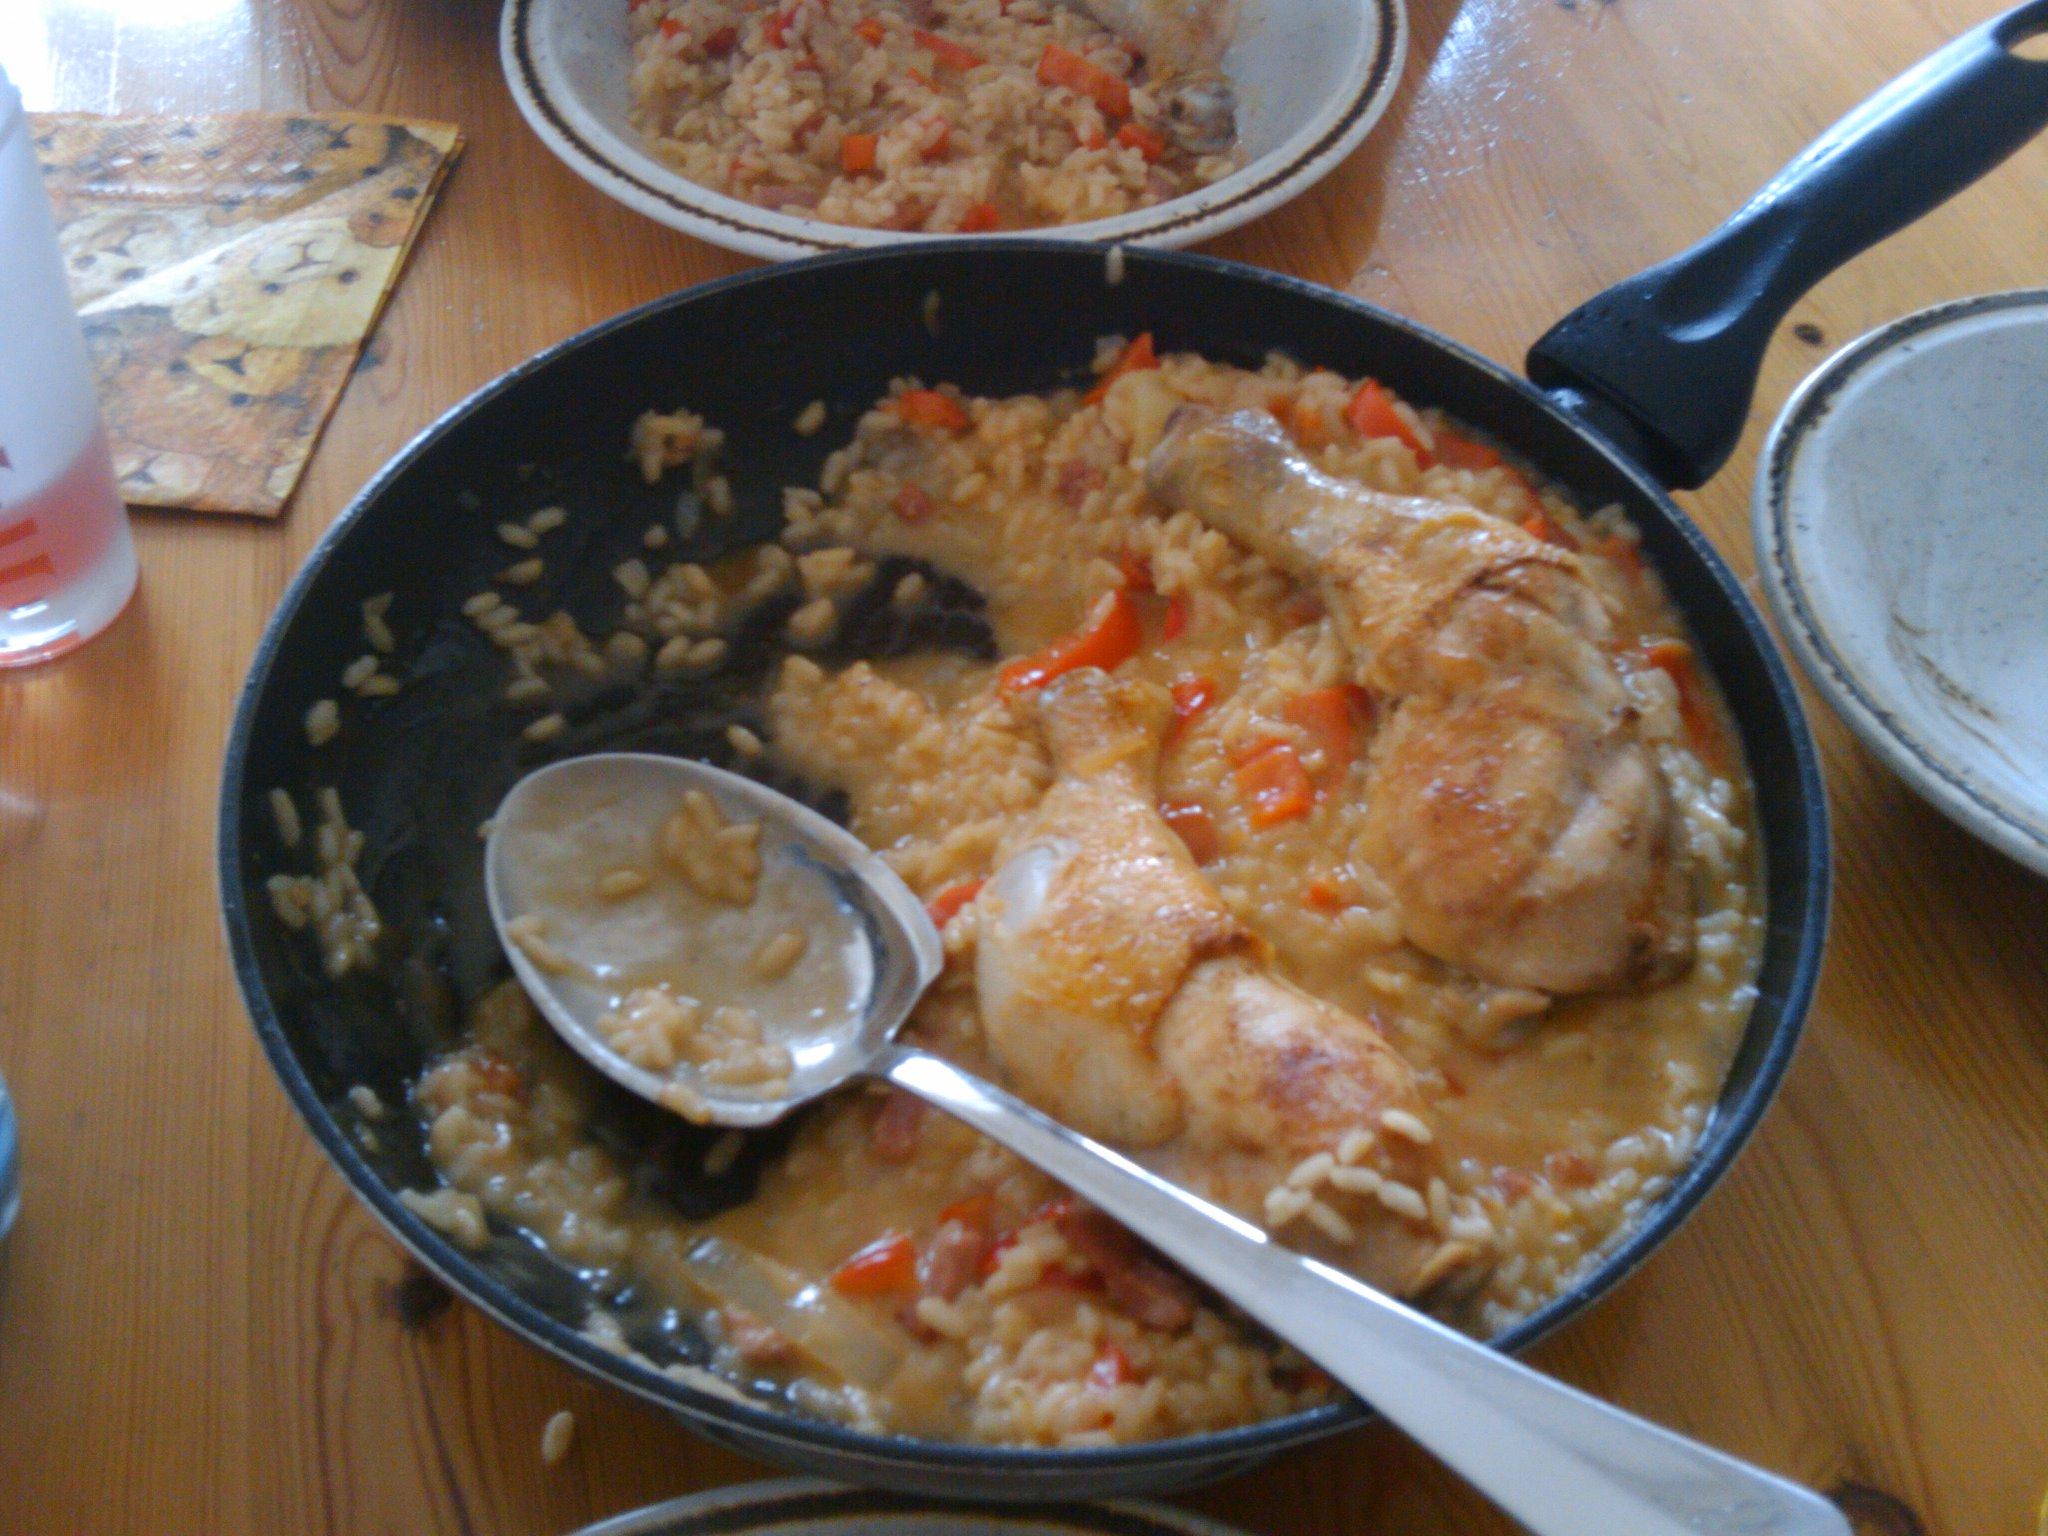 https://foodloader.net/The_Compiler_2009-11-23_rice_and_chicken.jpg